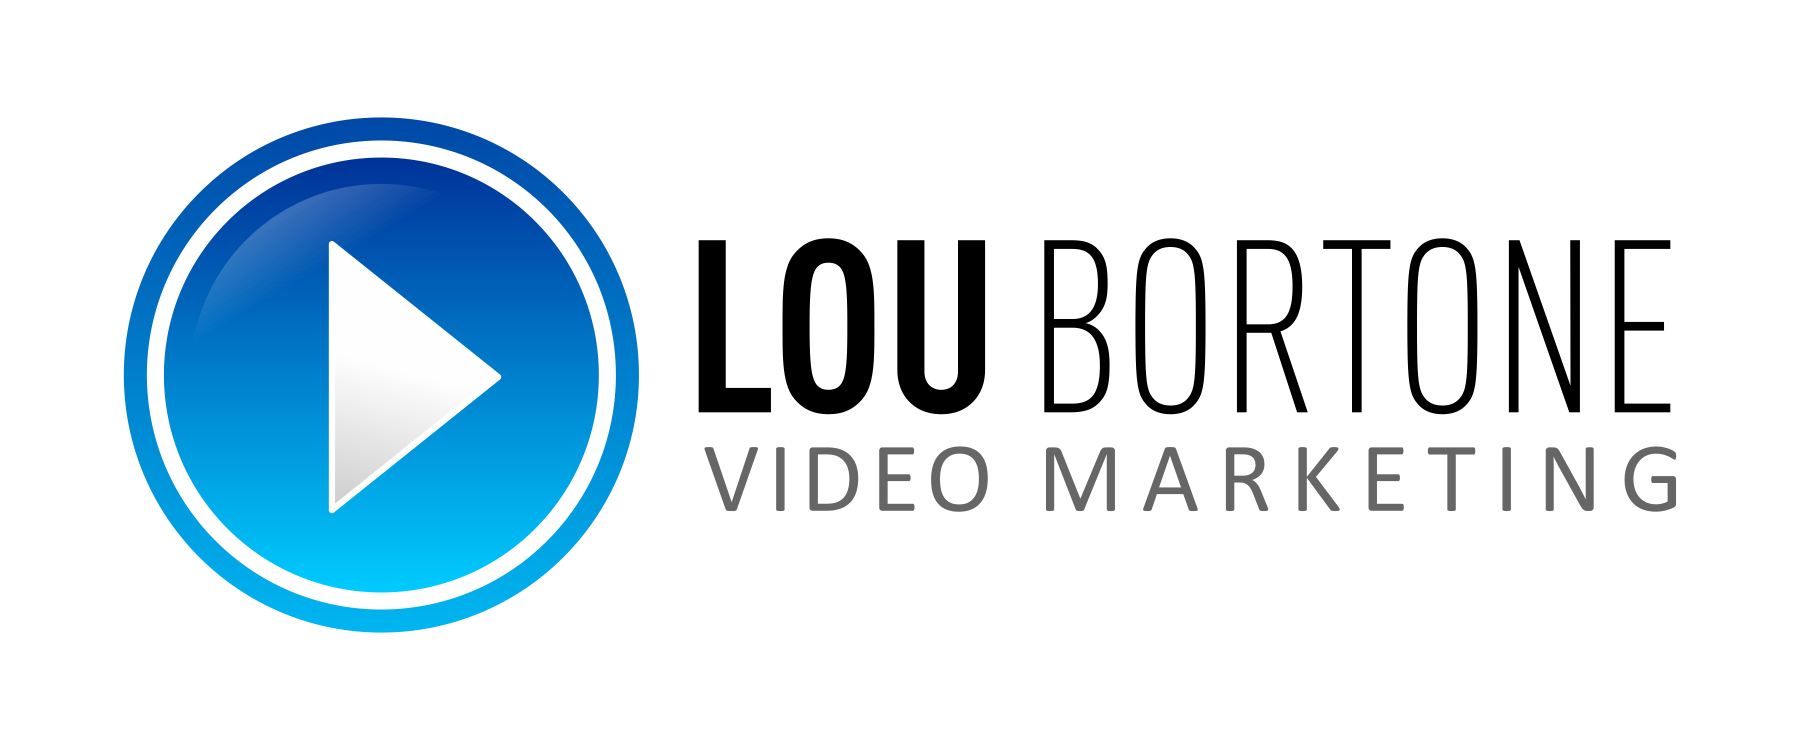 Video Marketing Academy